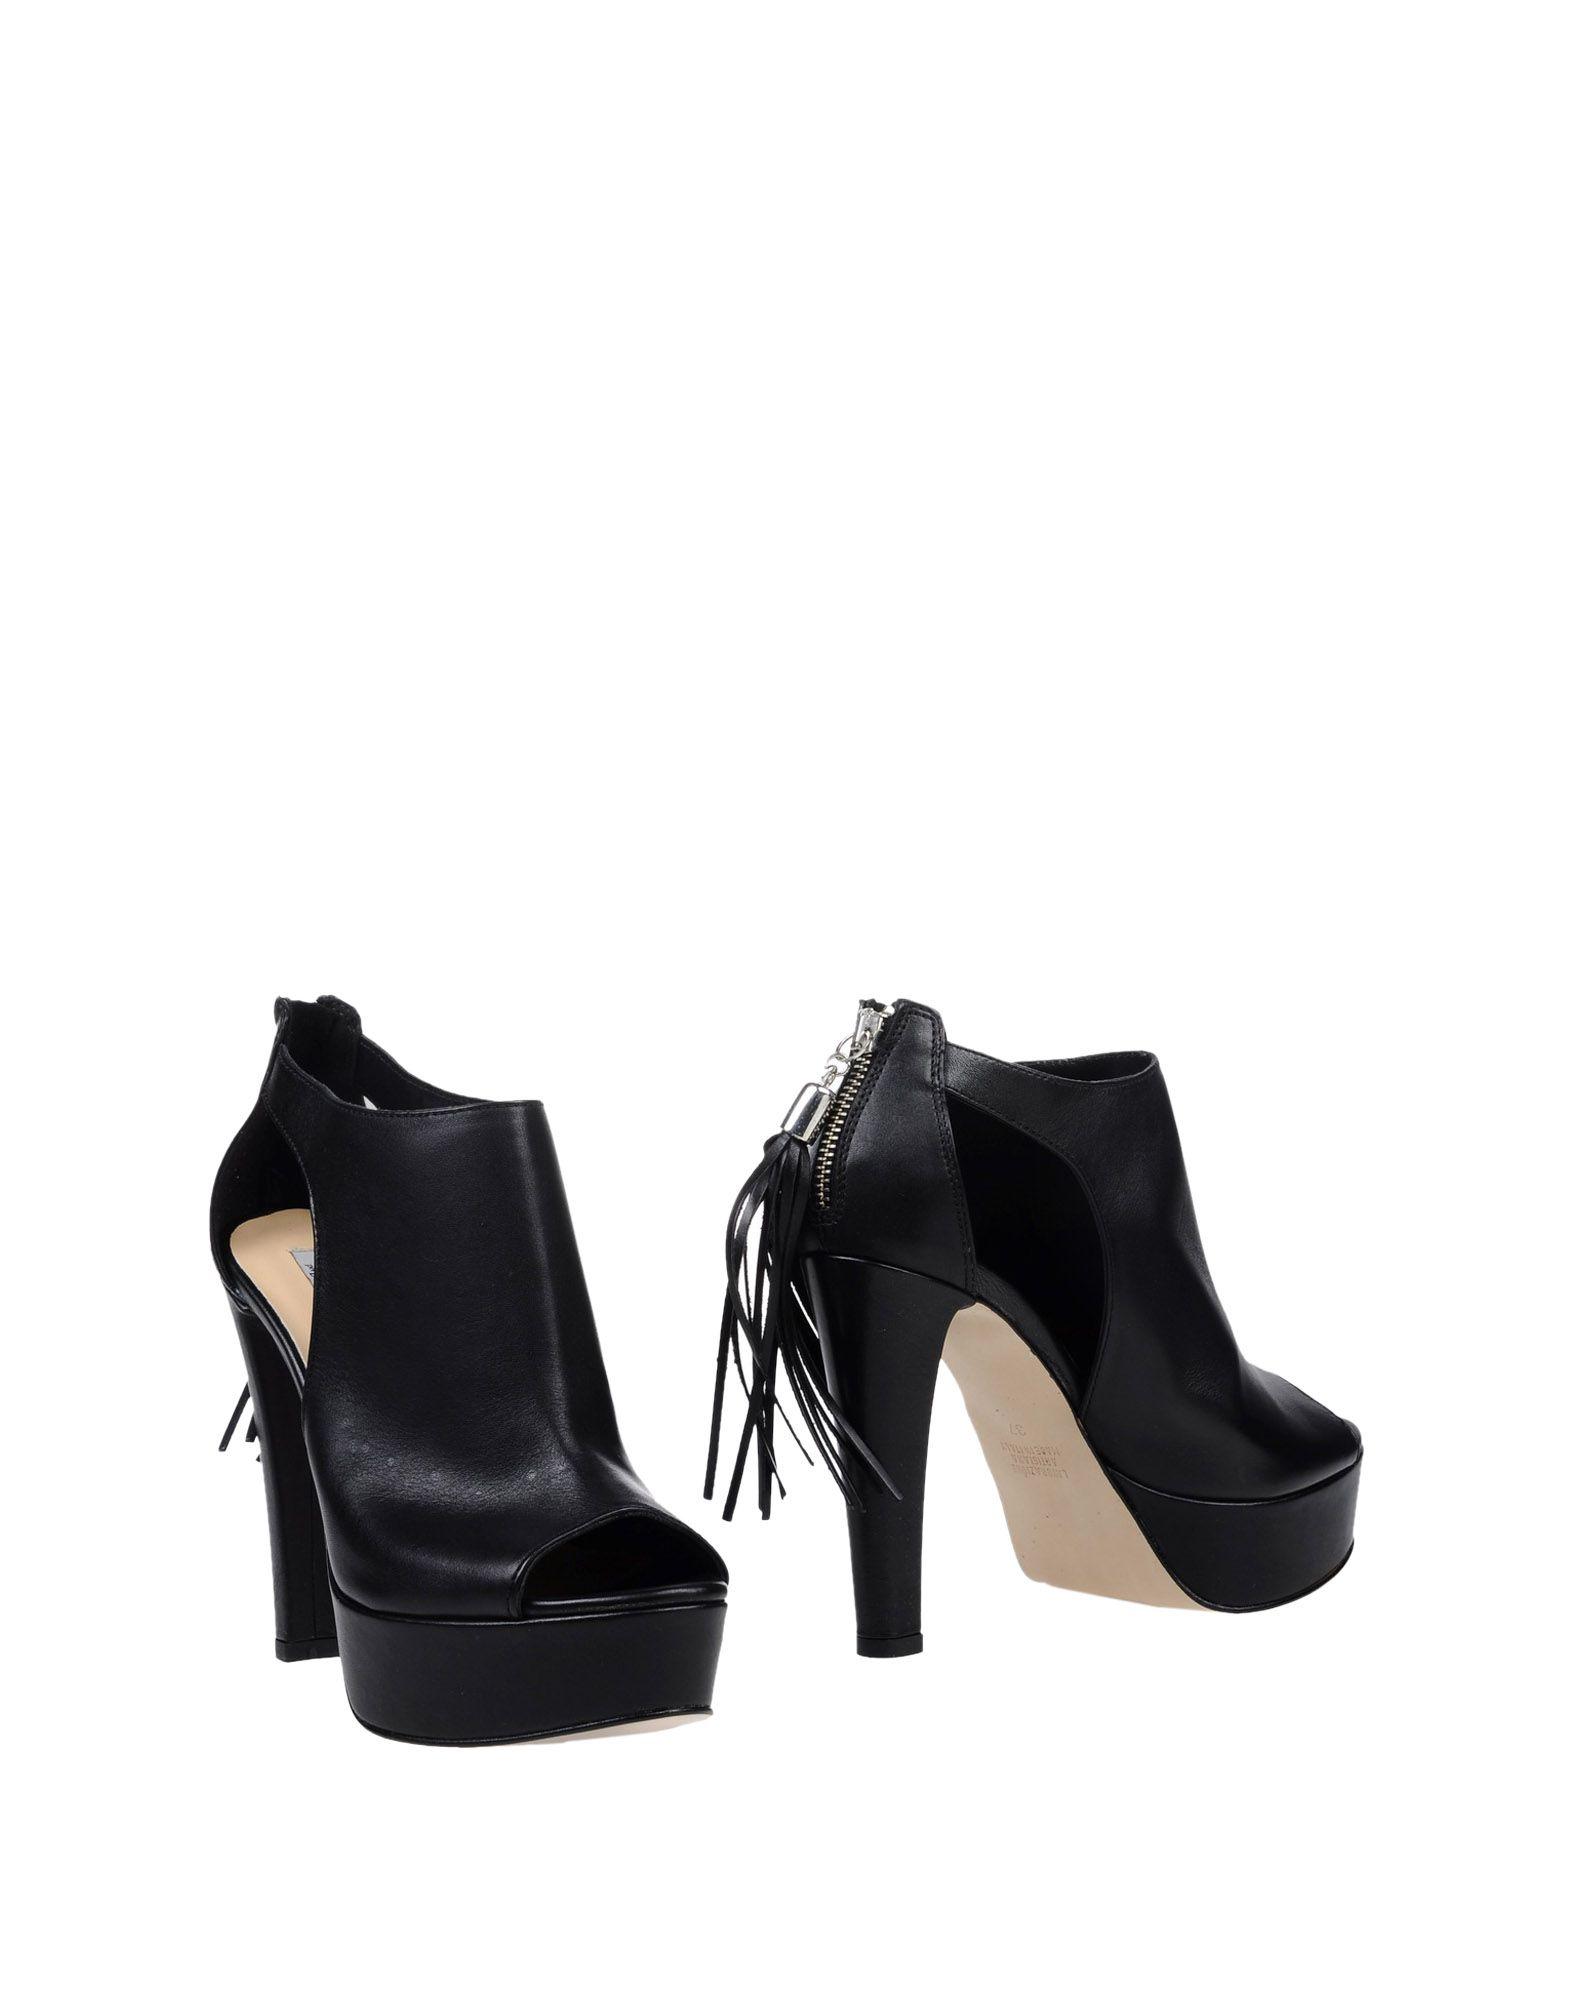 MANÌ per DONNA PIÙ Ботинки donna più обувь на шнурках